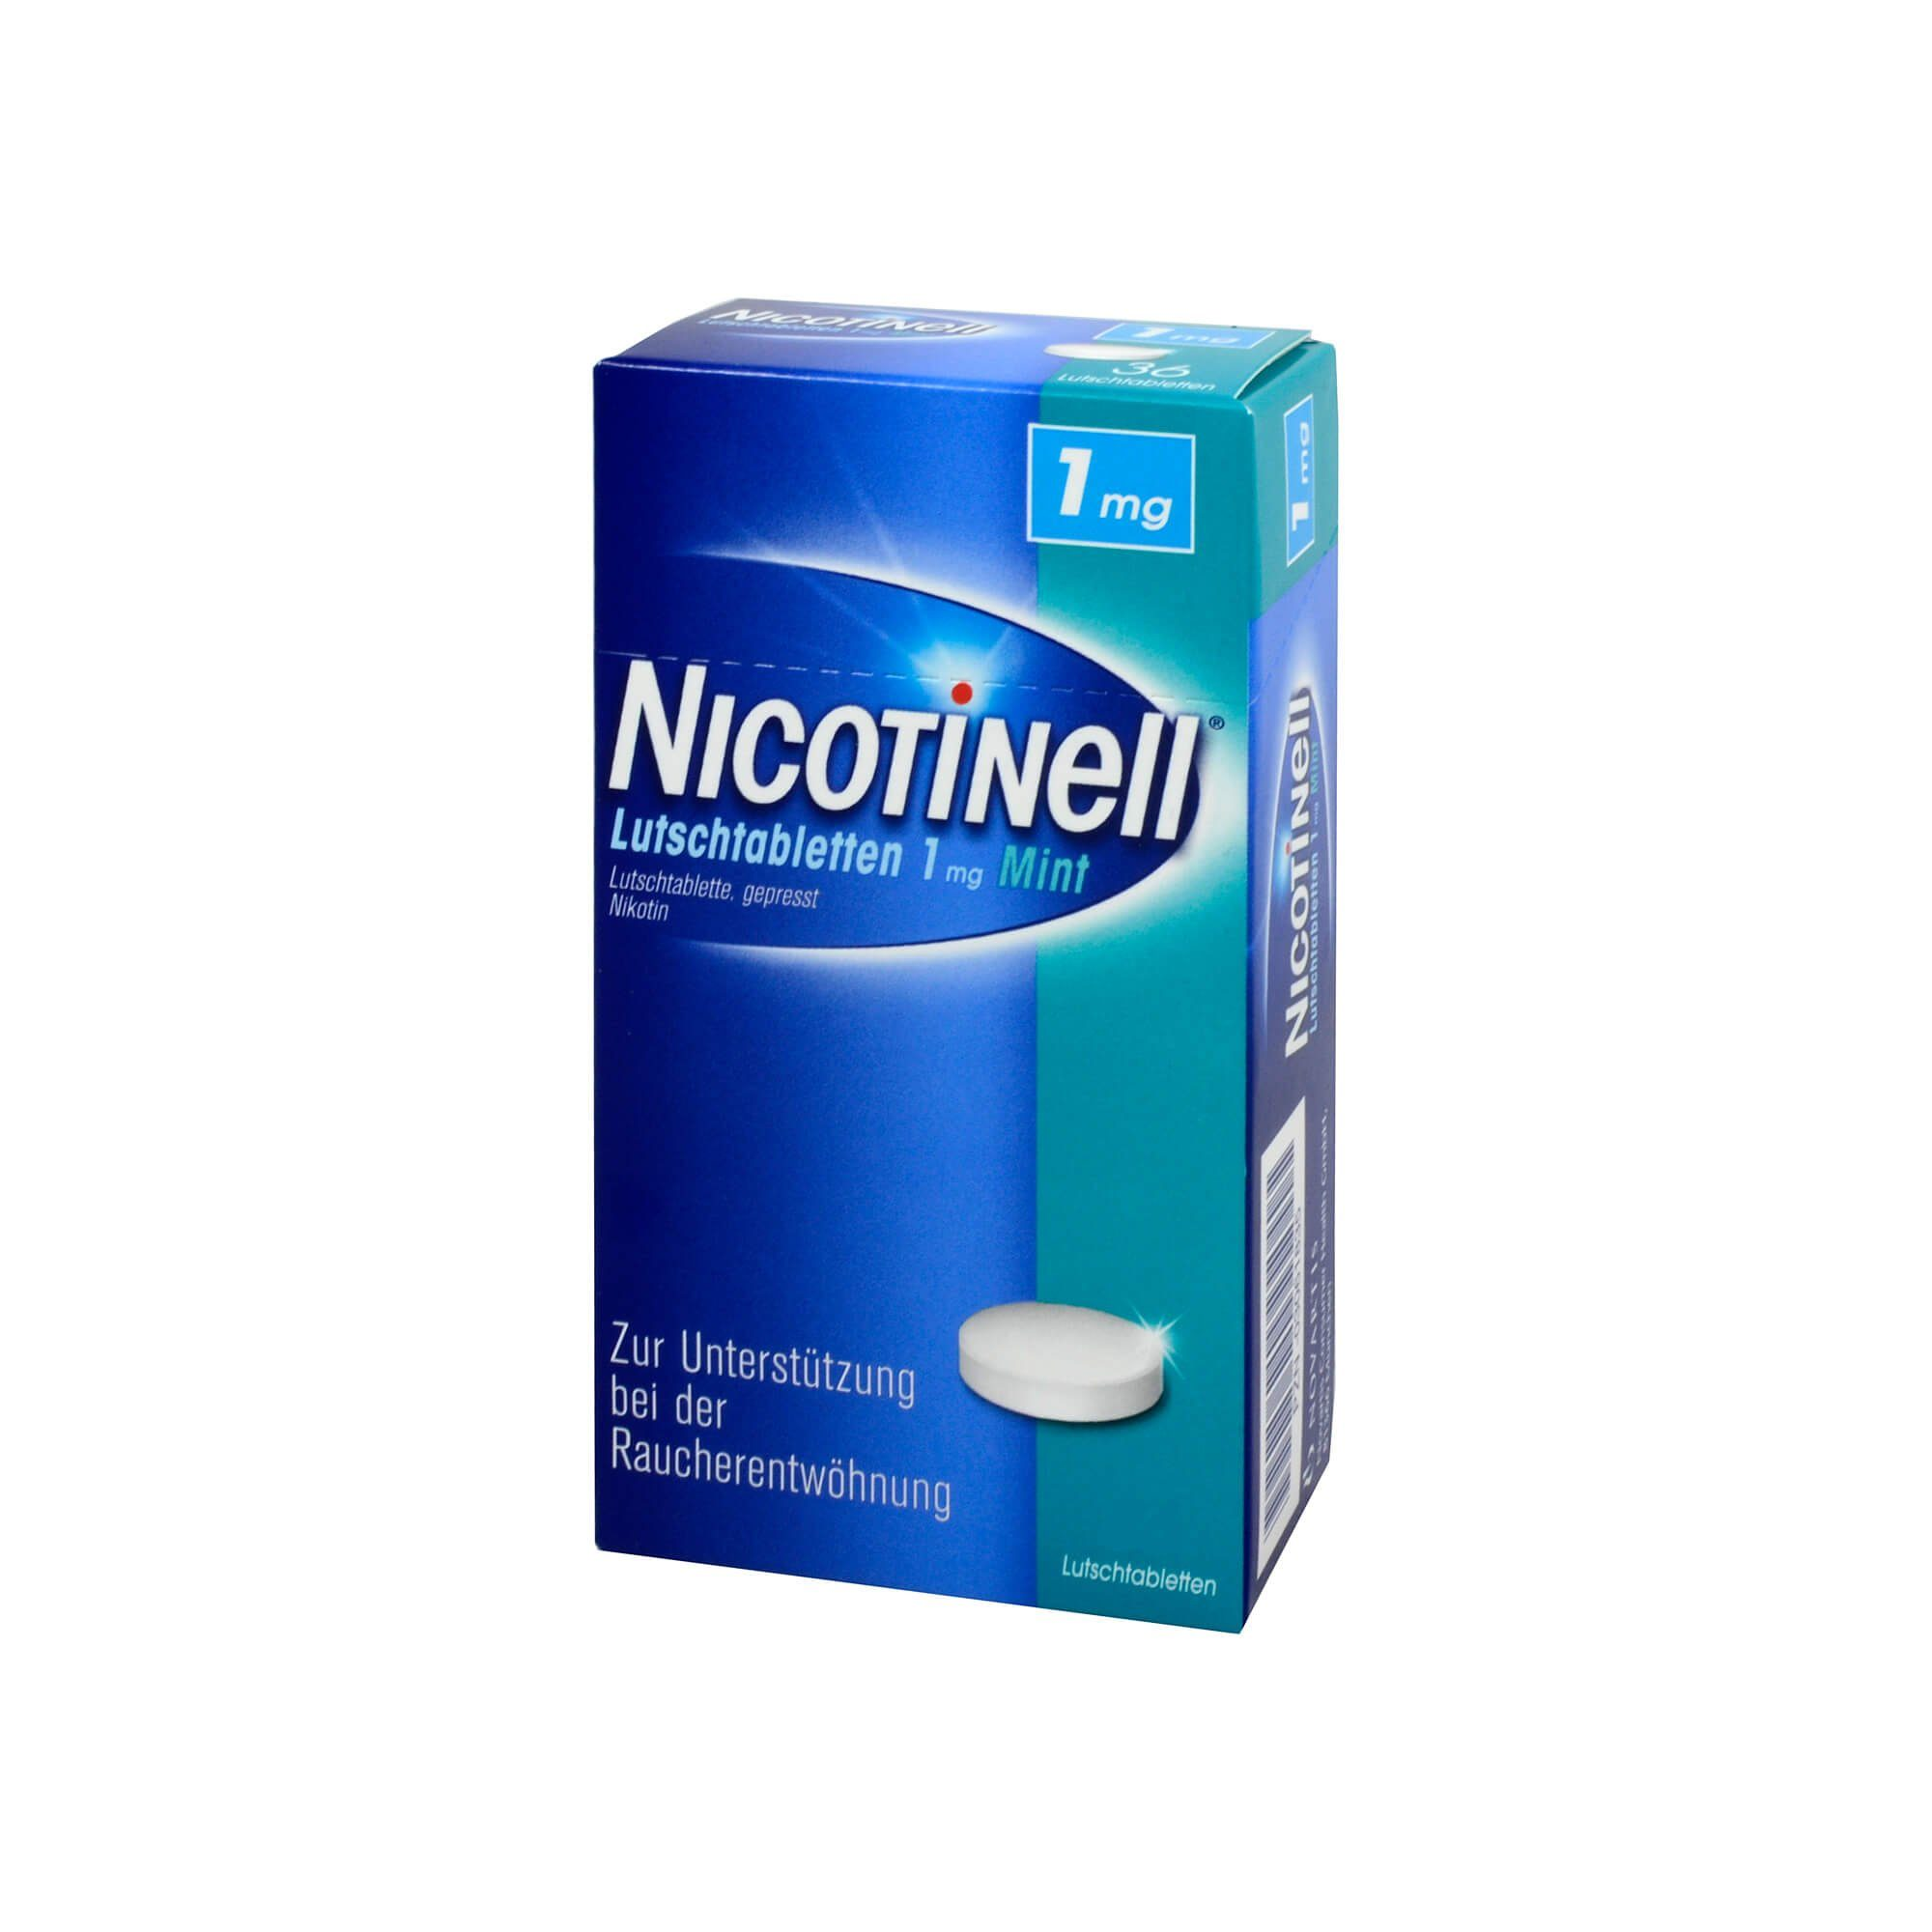 Nicotinell Lutschtabletten 1 mg Mint, 96 St